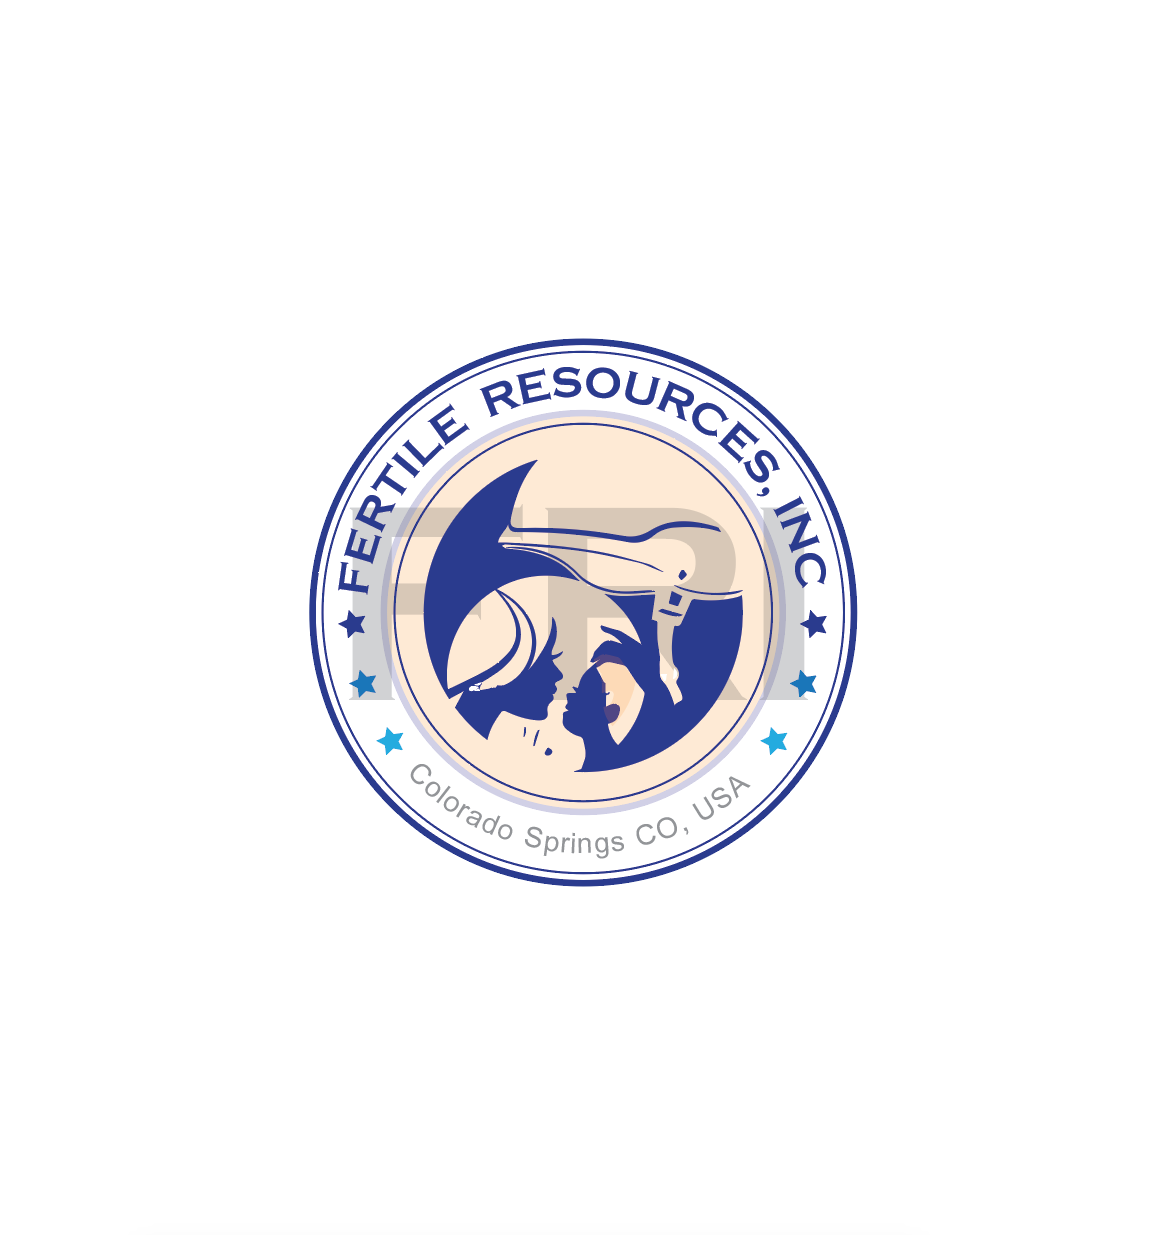 Logo Design by Sampath Gunathilaka - Entry No. 40 in the Logo Design Contest Fertile Resources, Inc. Logo Design.